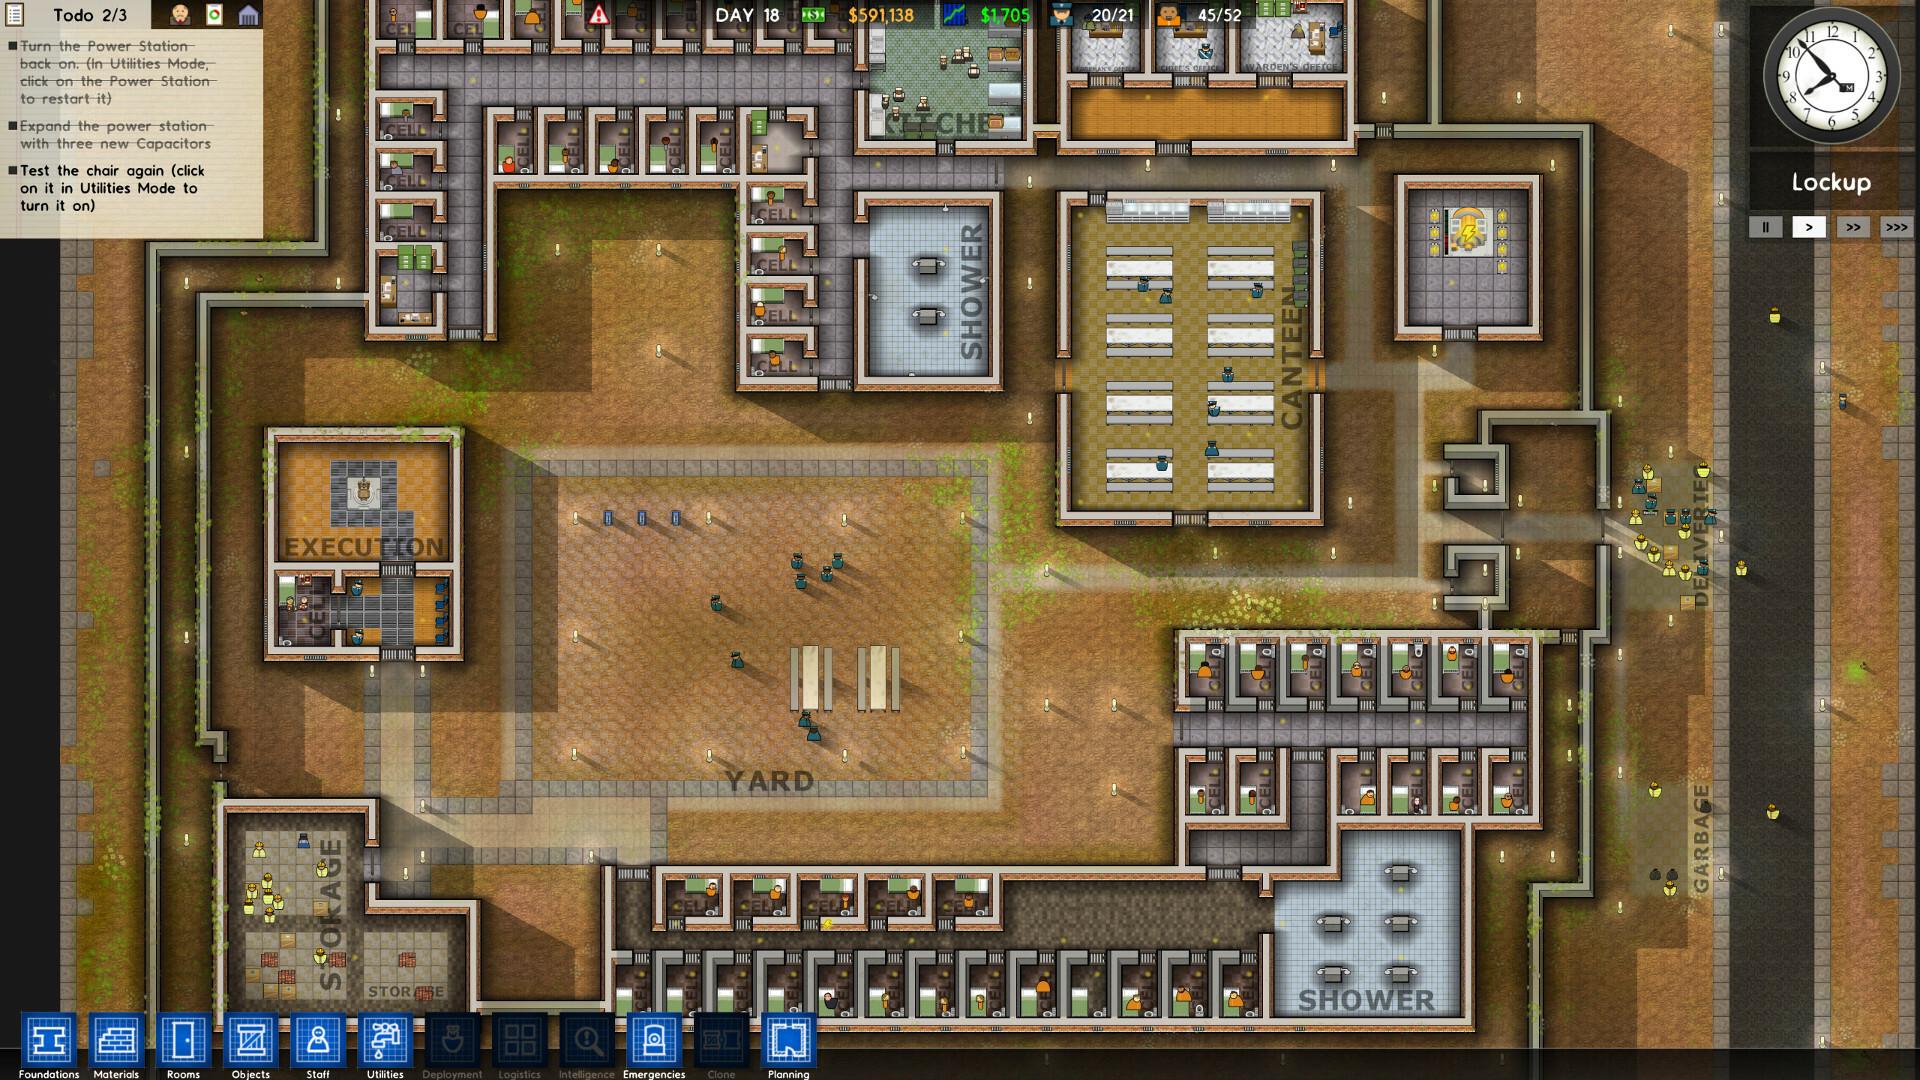 prison-architect-pc-screenshot-1